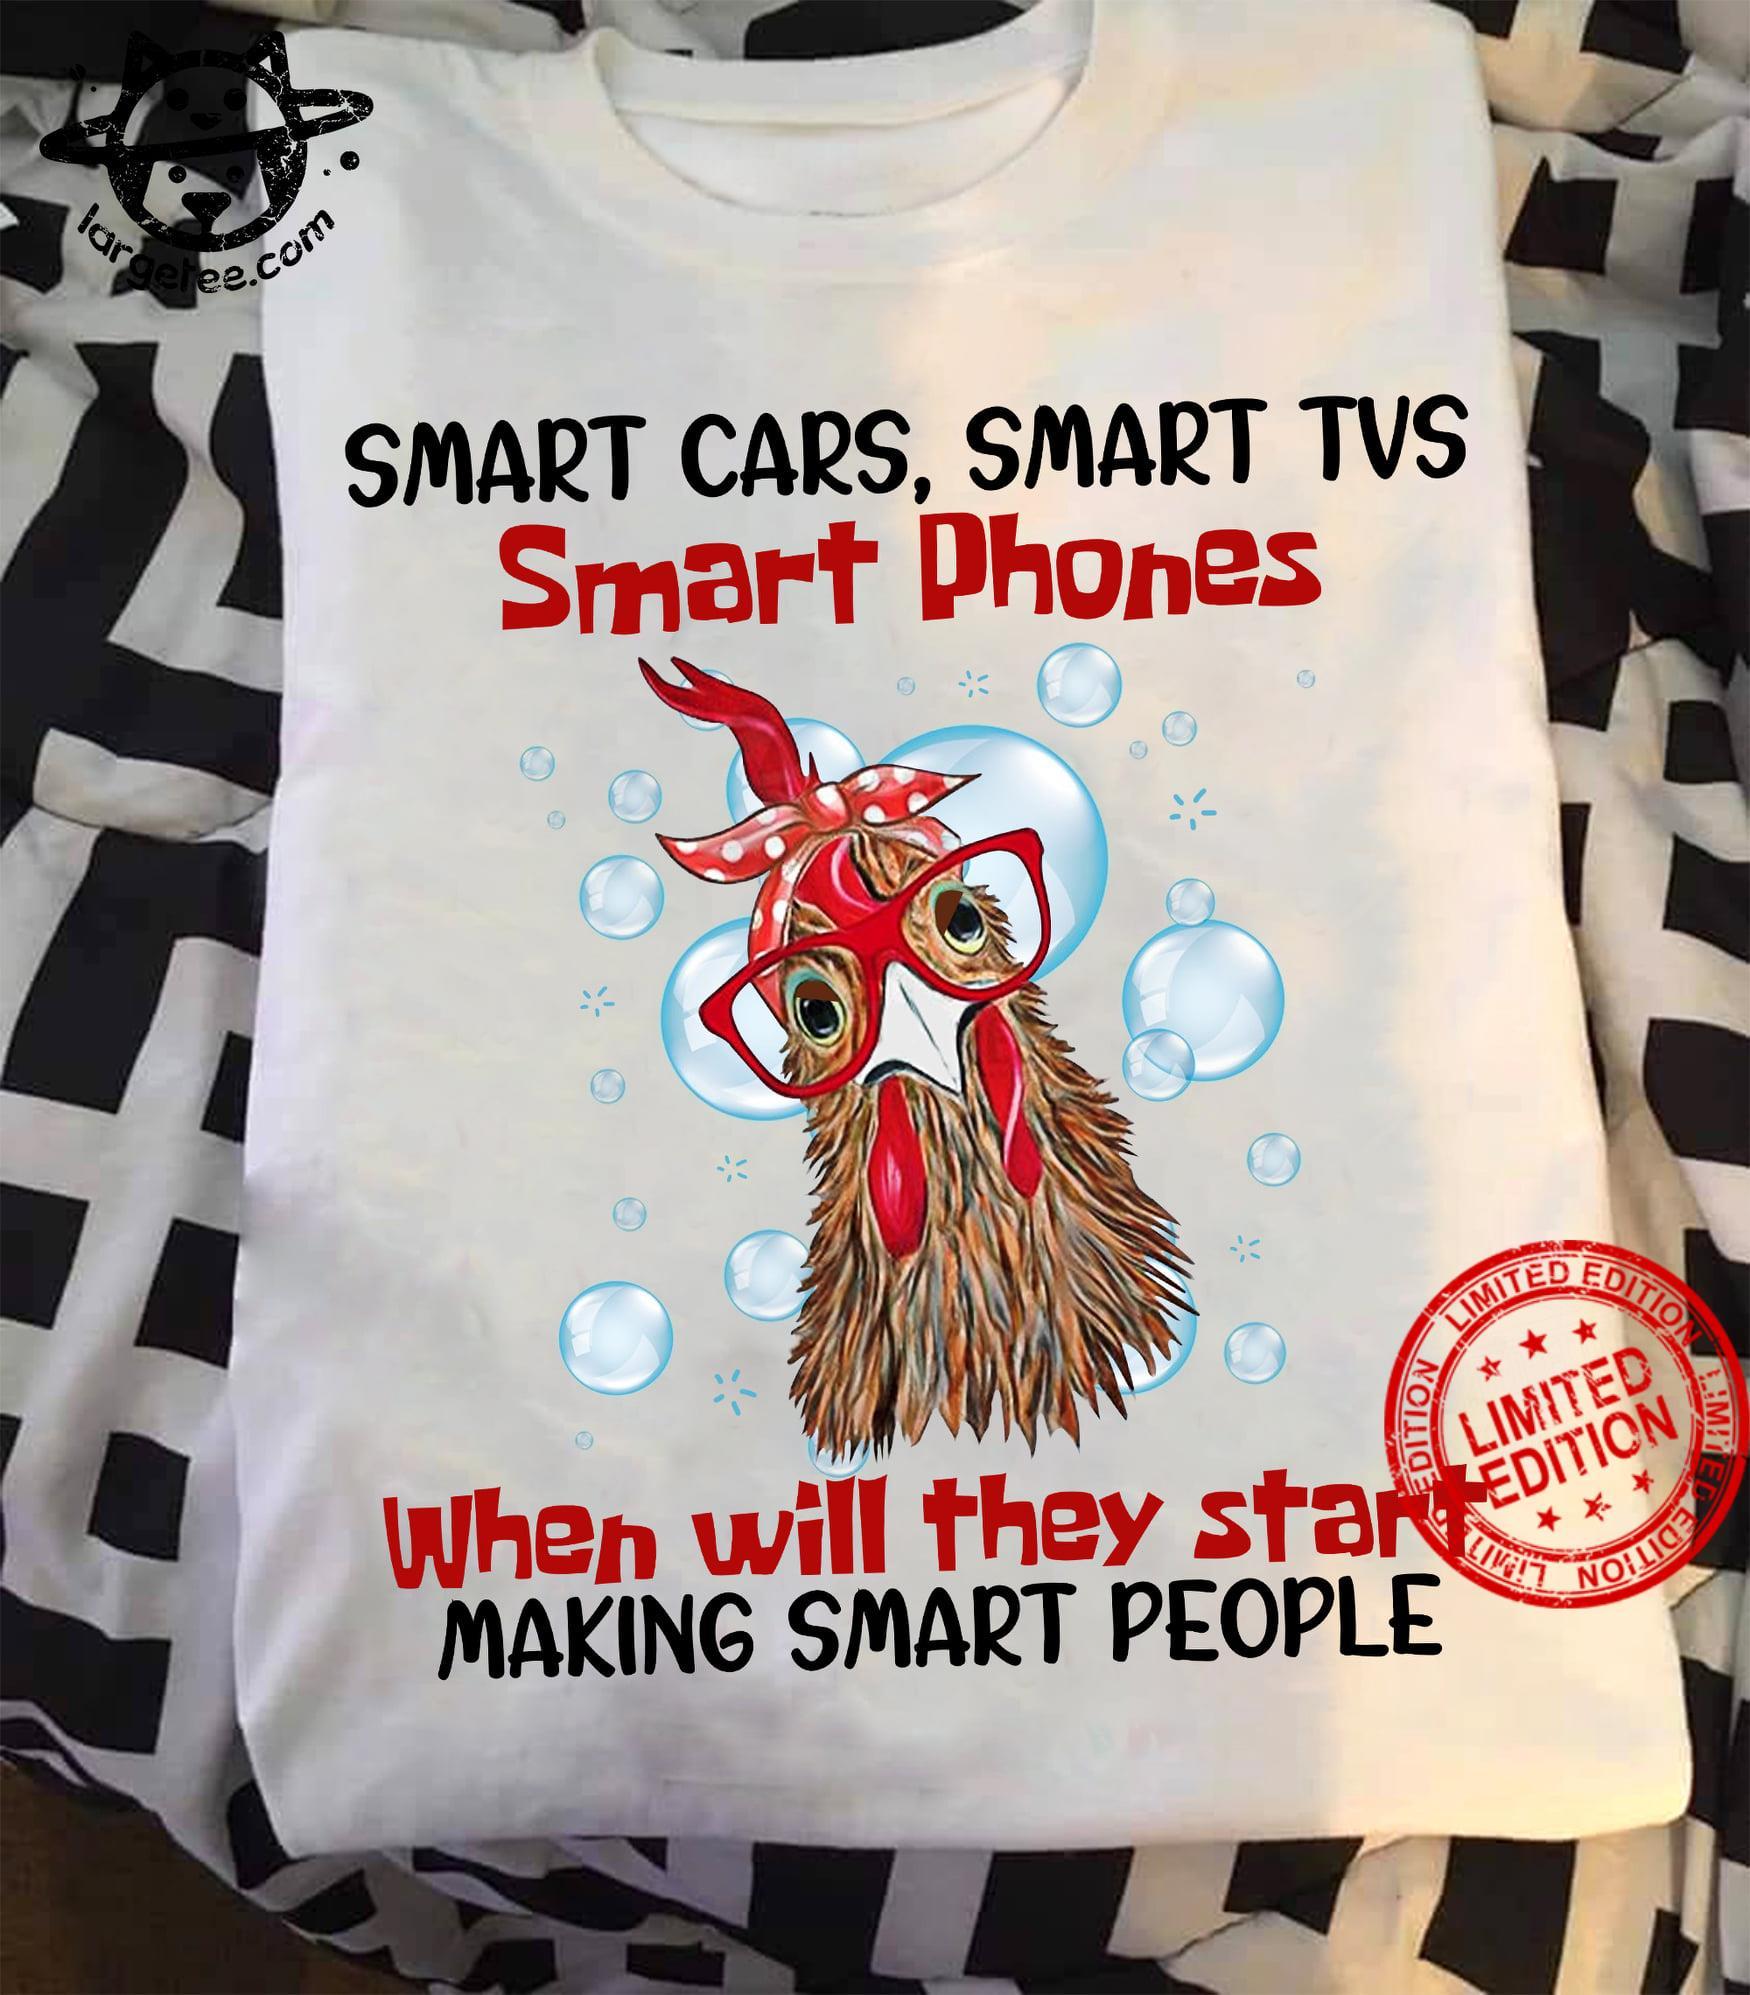 Smart Cars Smart Tvs Smart Phones When Will They Start Making Smart People Shirt